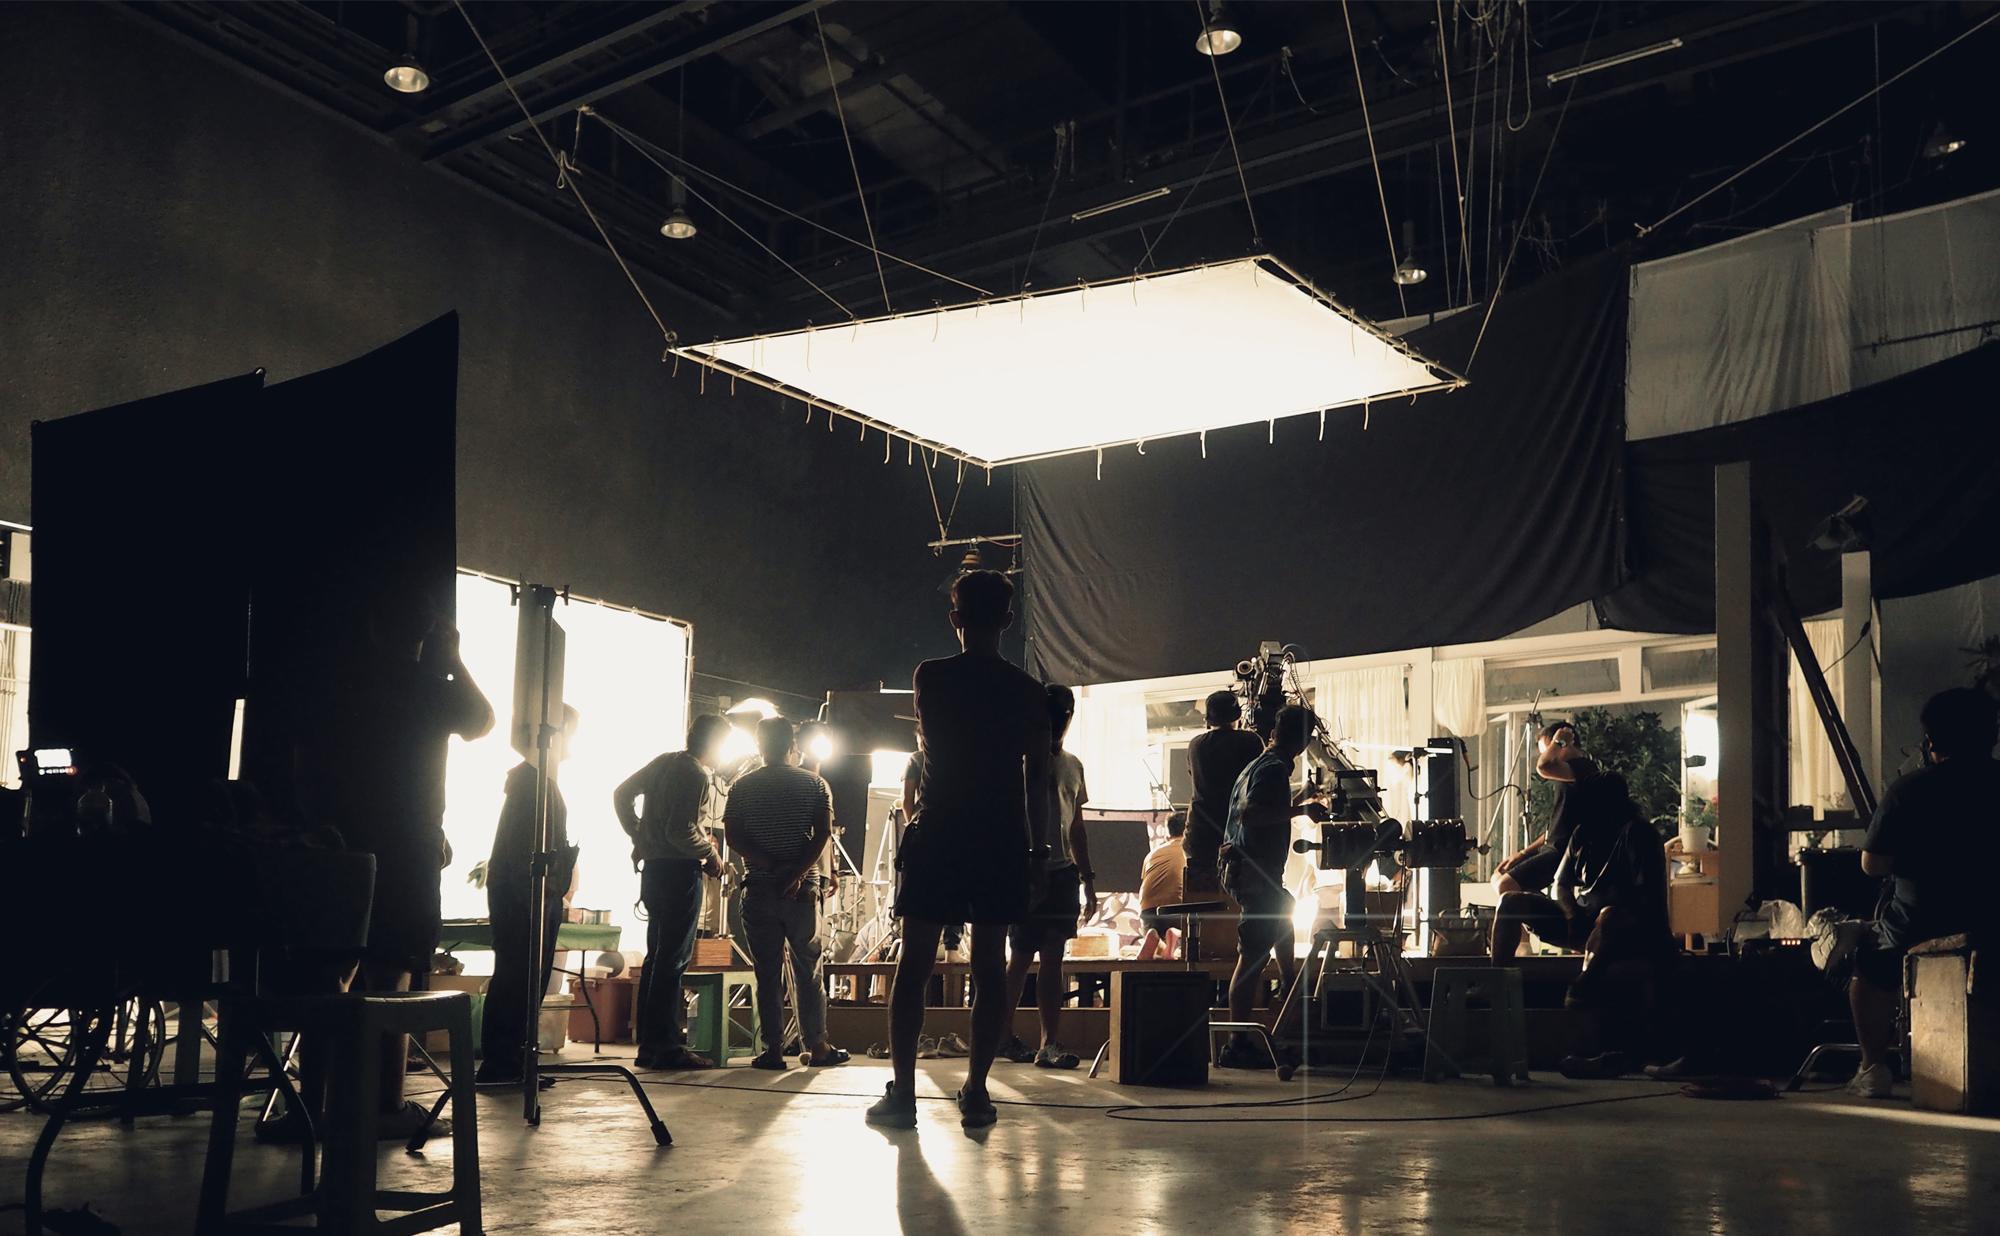 GOGYOU media production